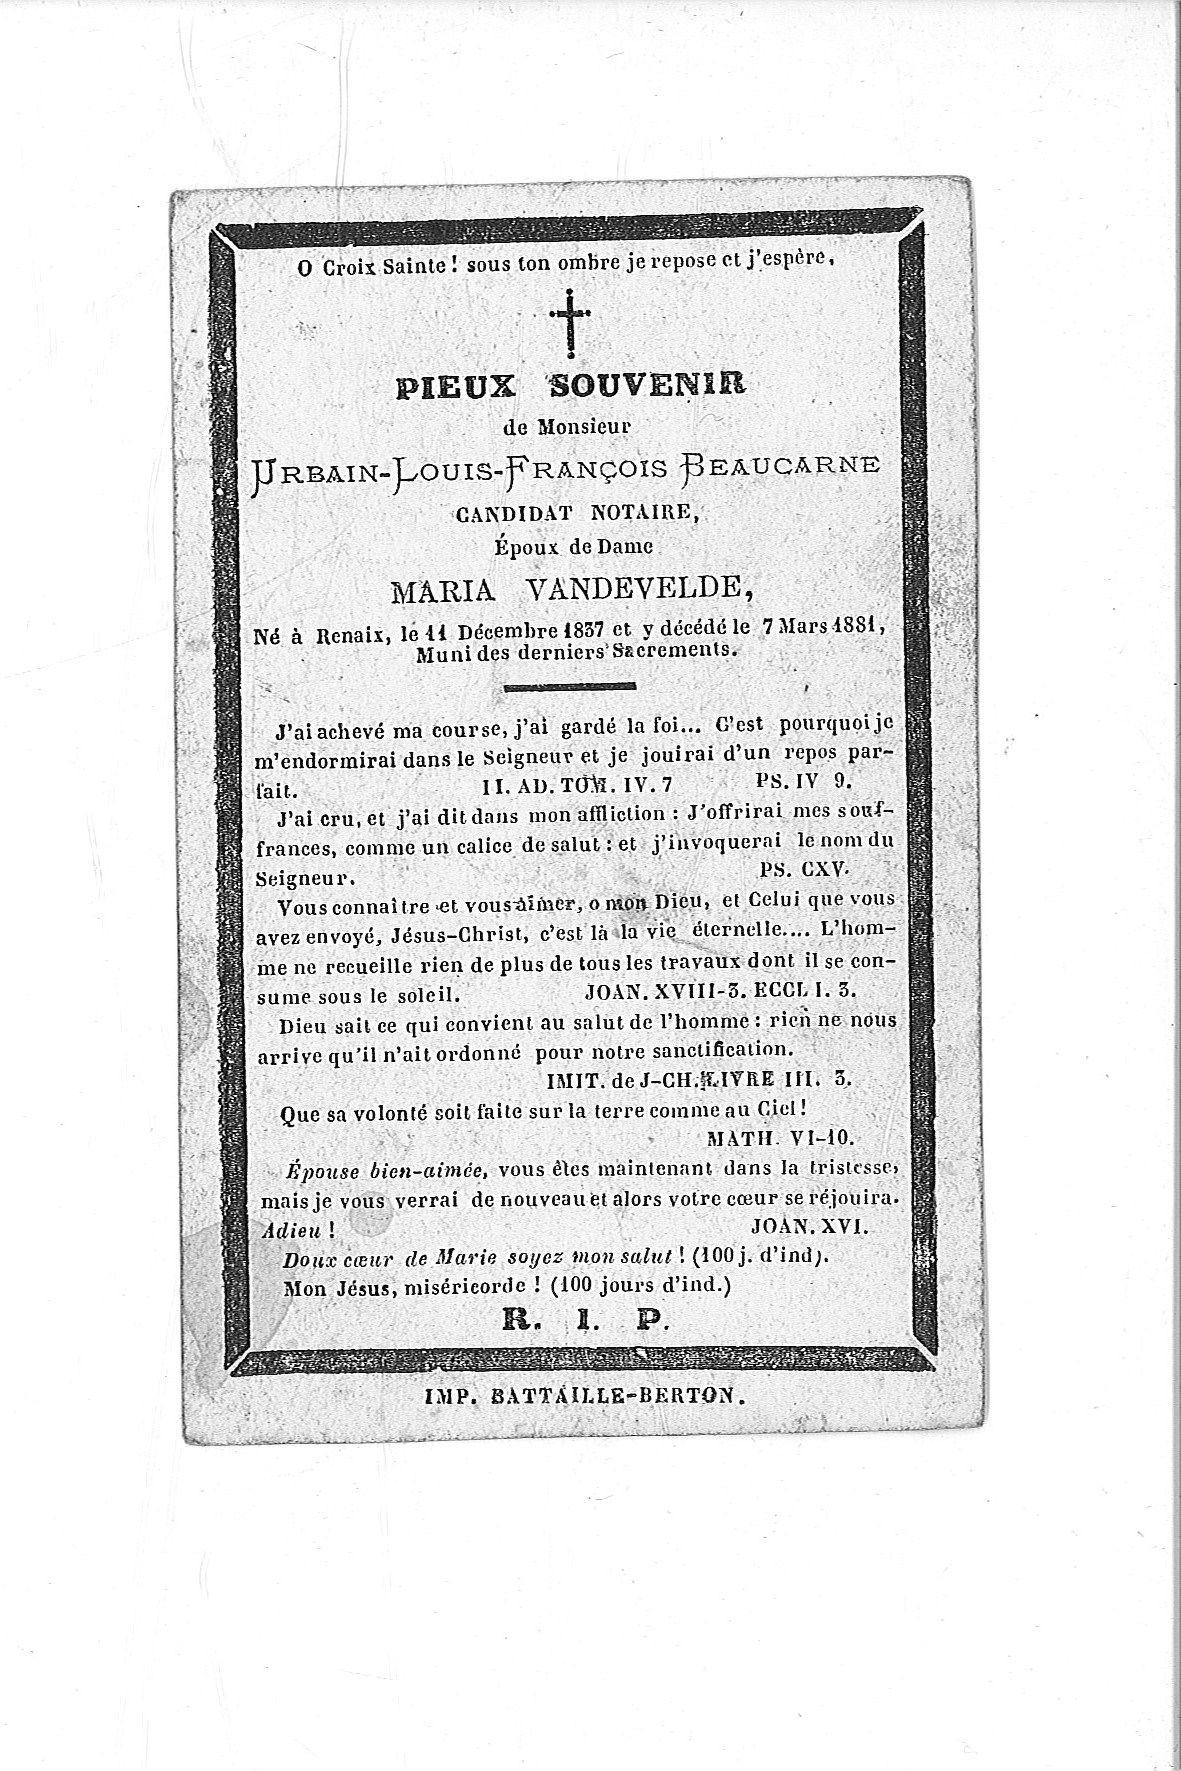 Urbain-Louis-François(1882)20090806155105_00004.jpg